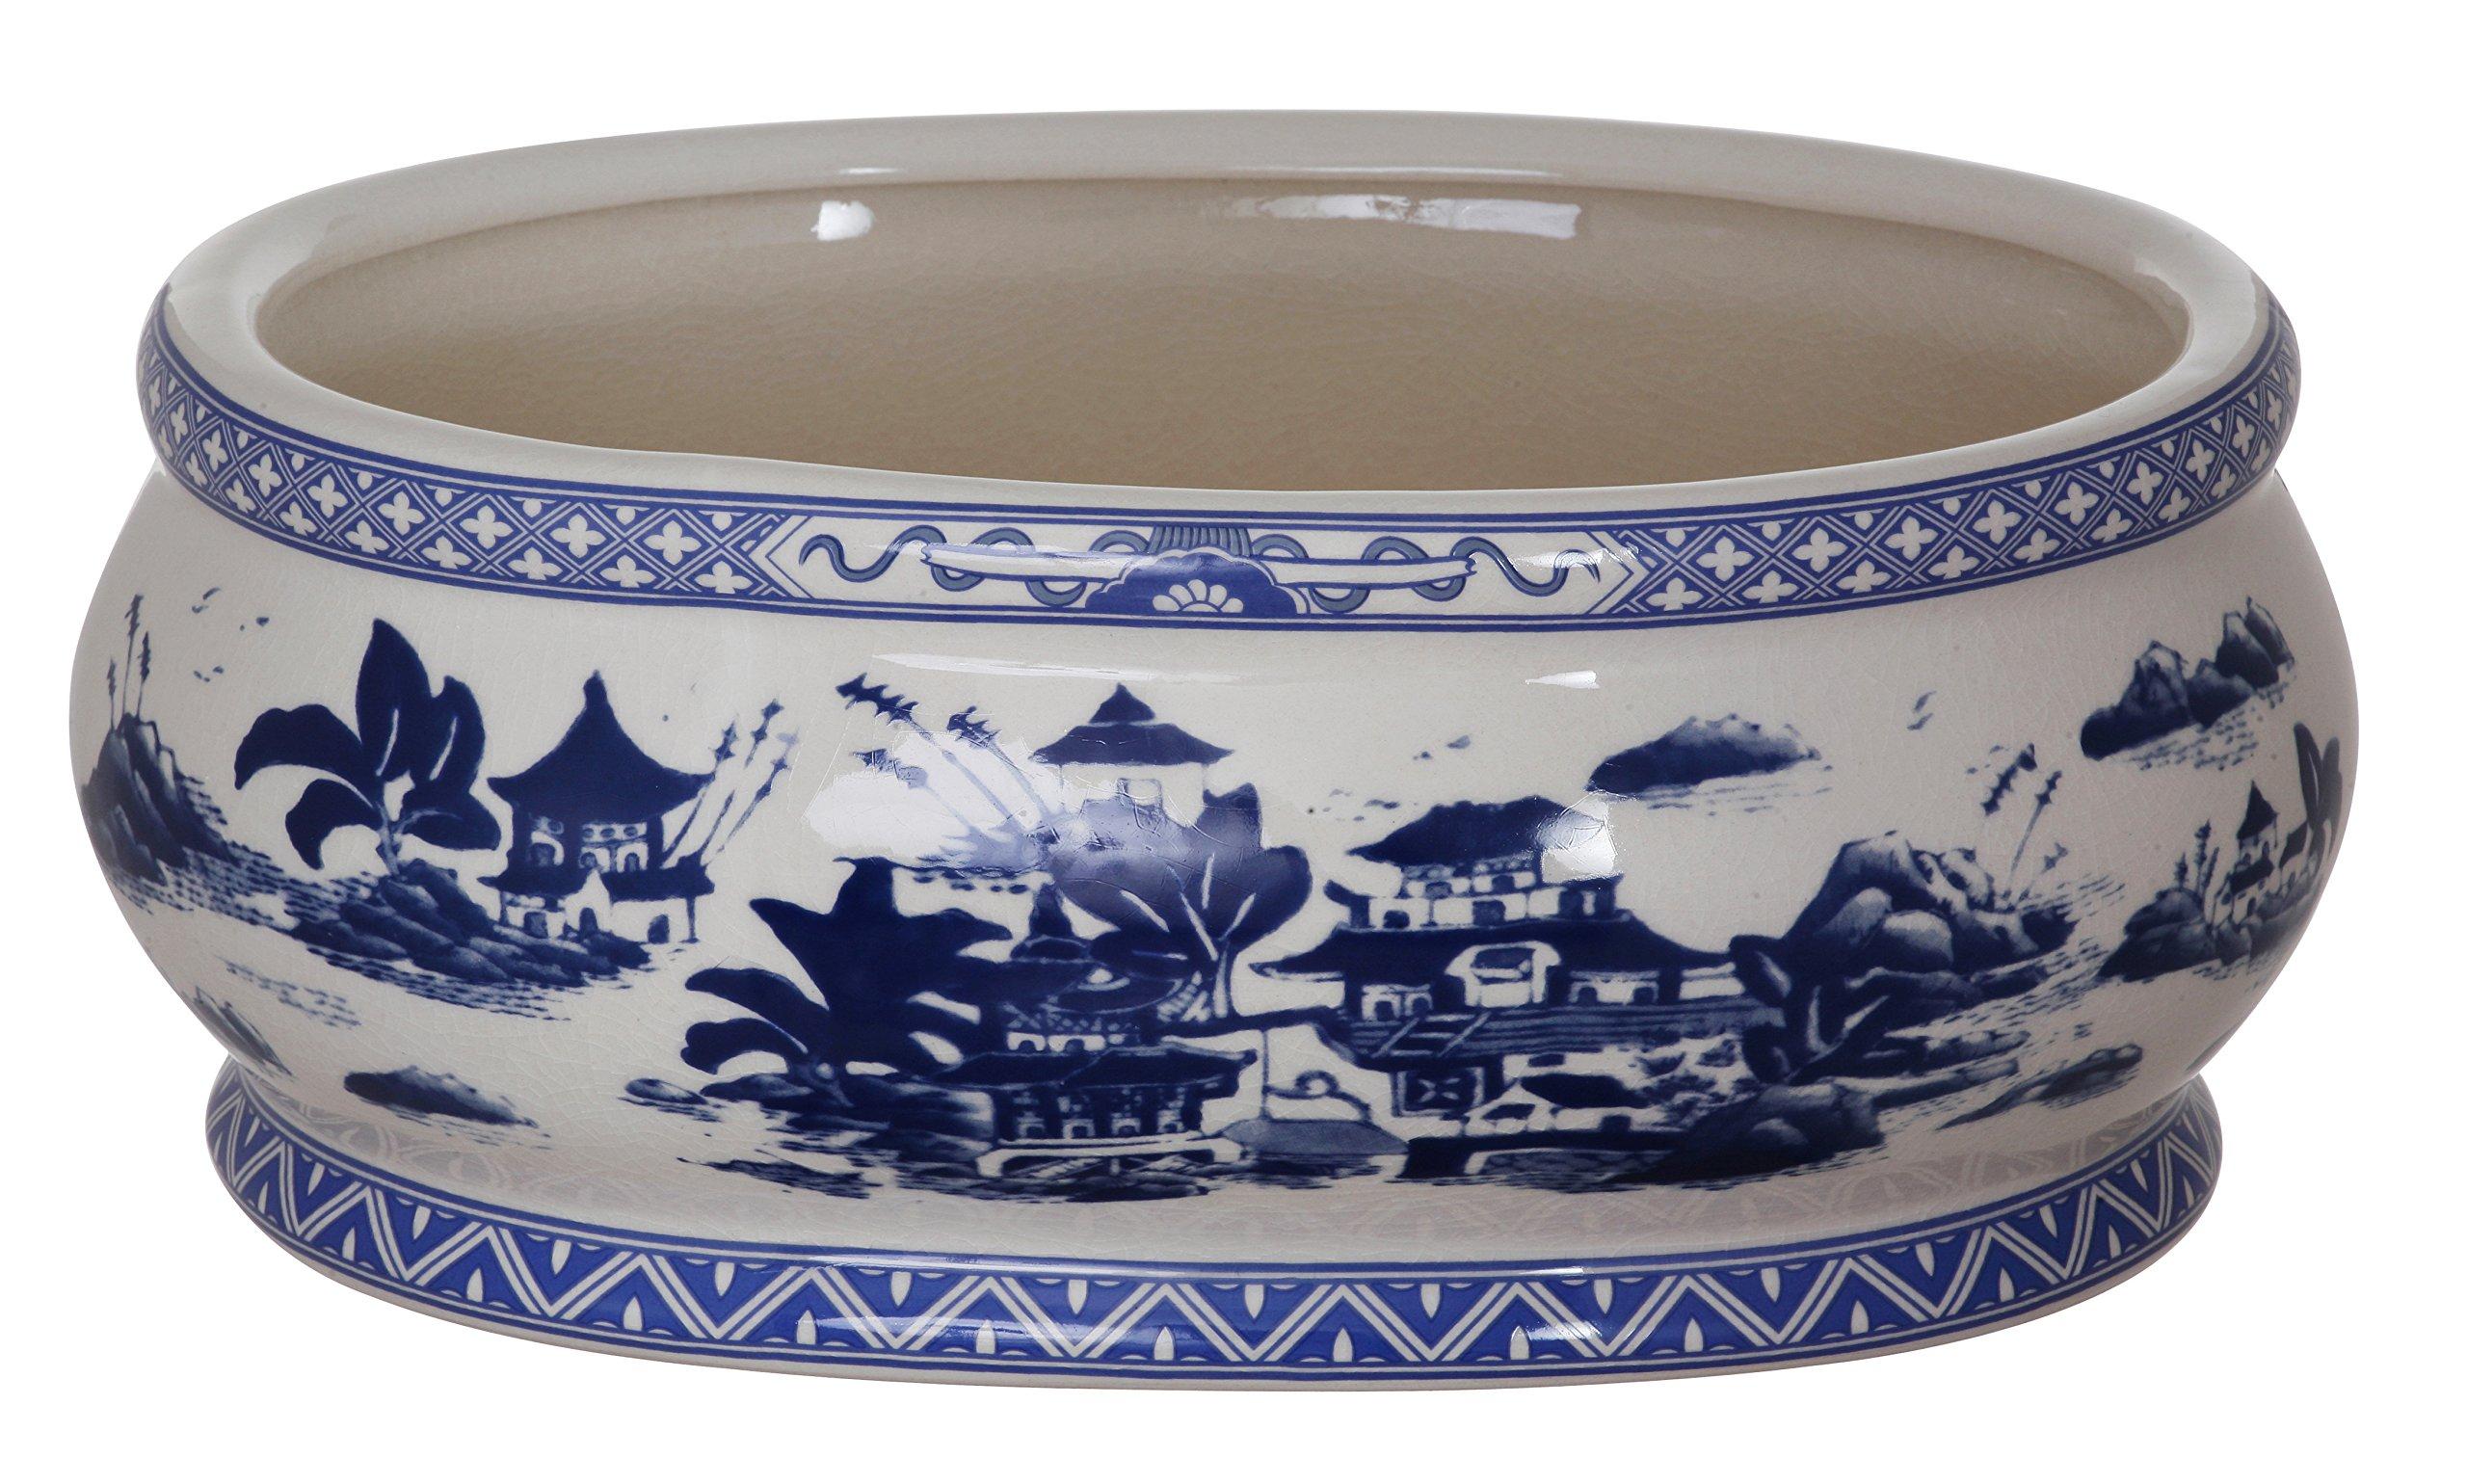 Winward Silks China Village Oval Planter, 14.5-Inch Wide, Blue